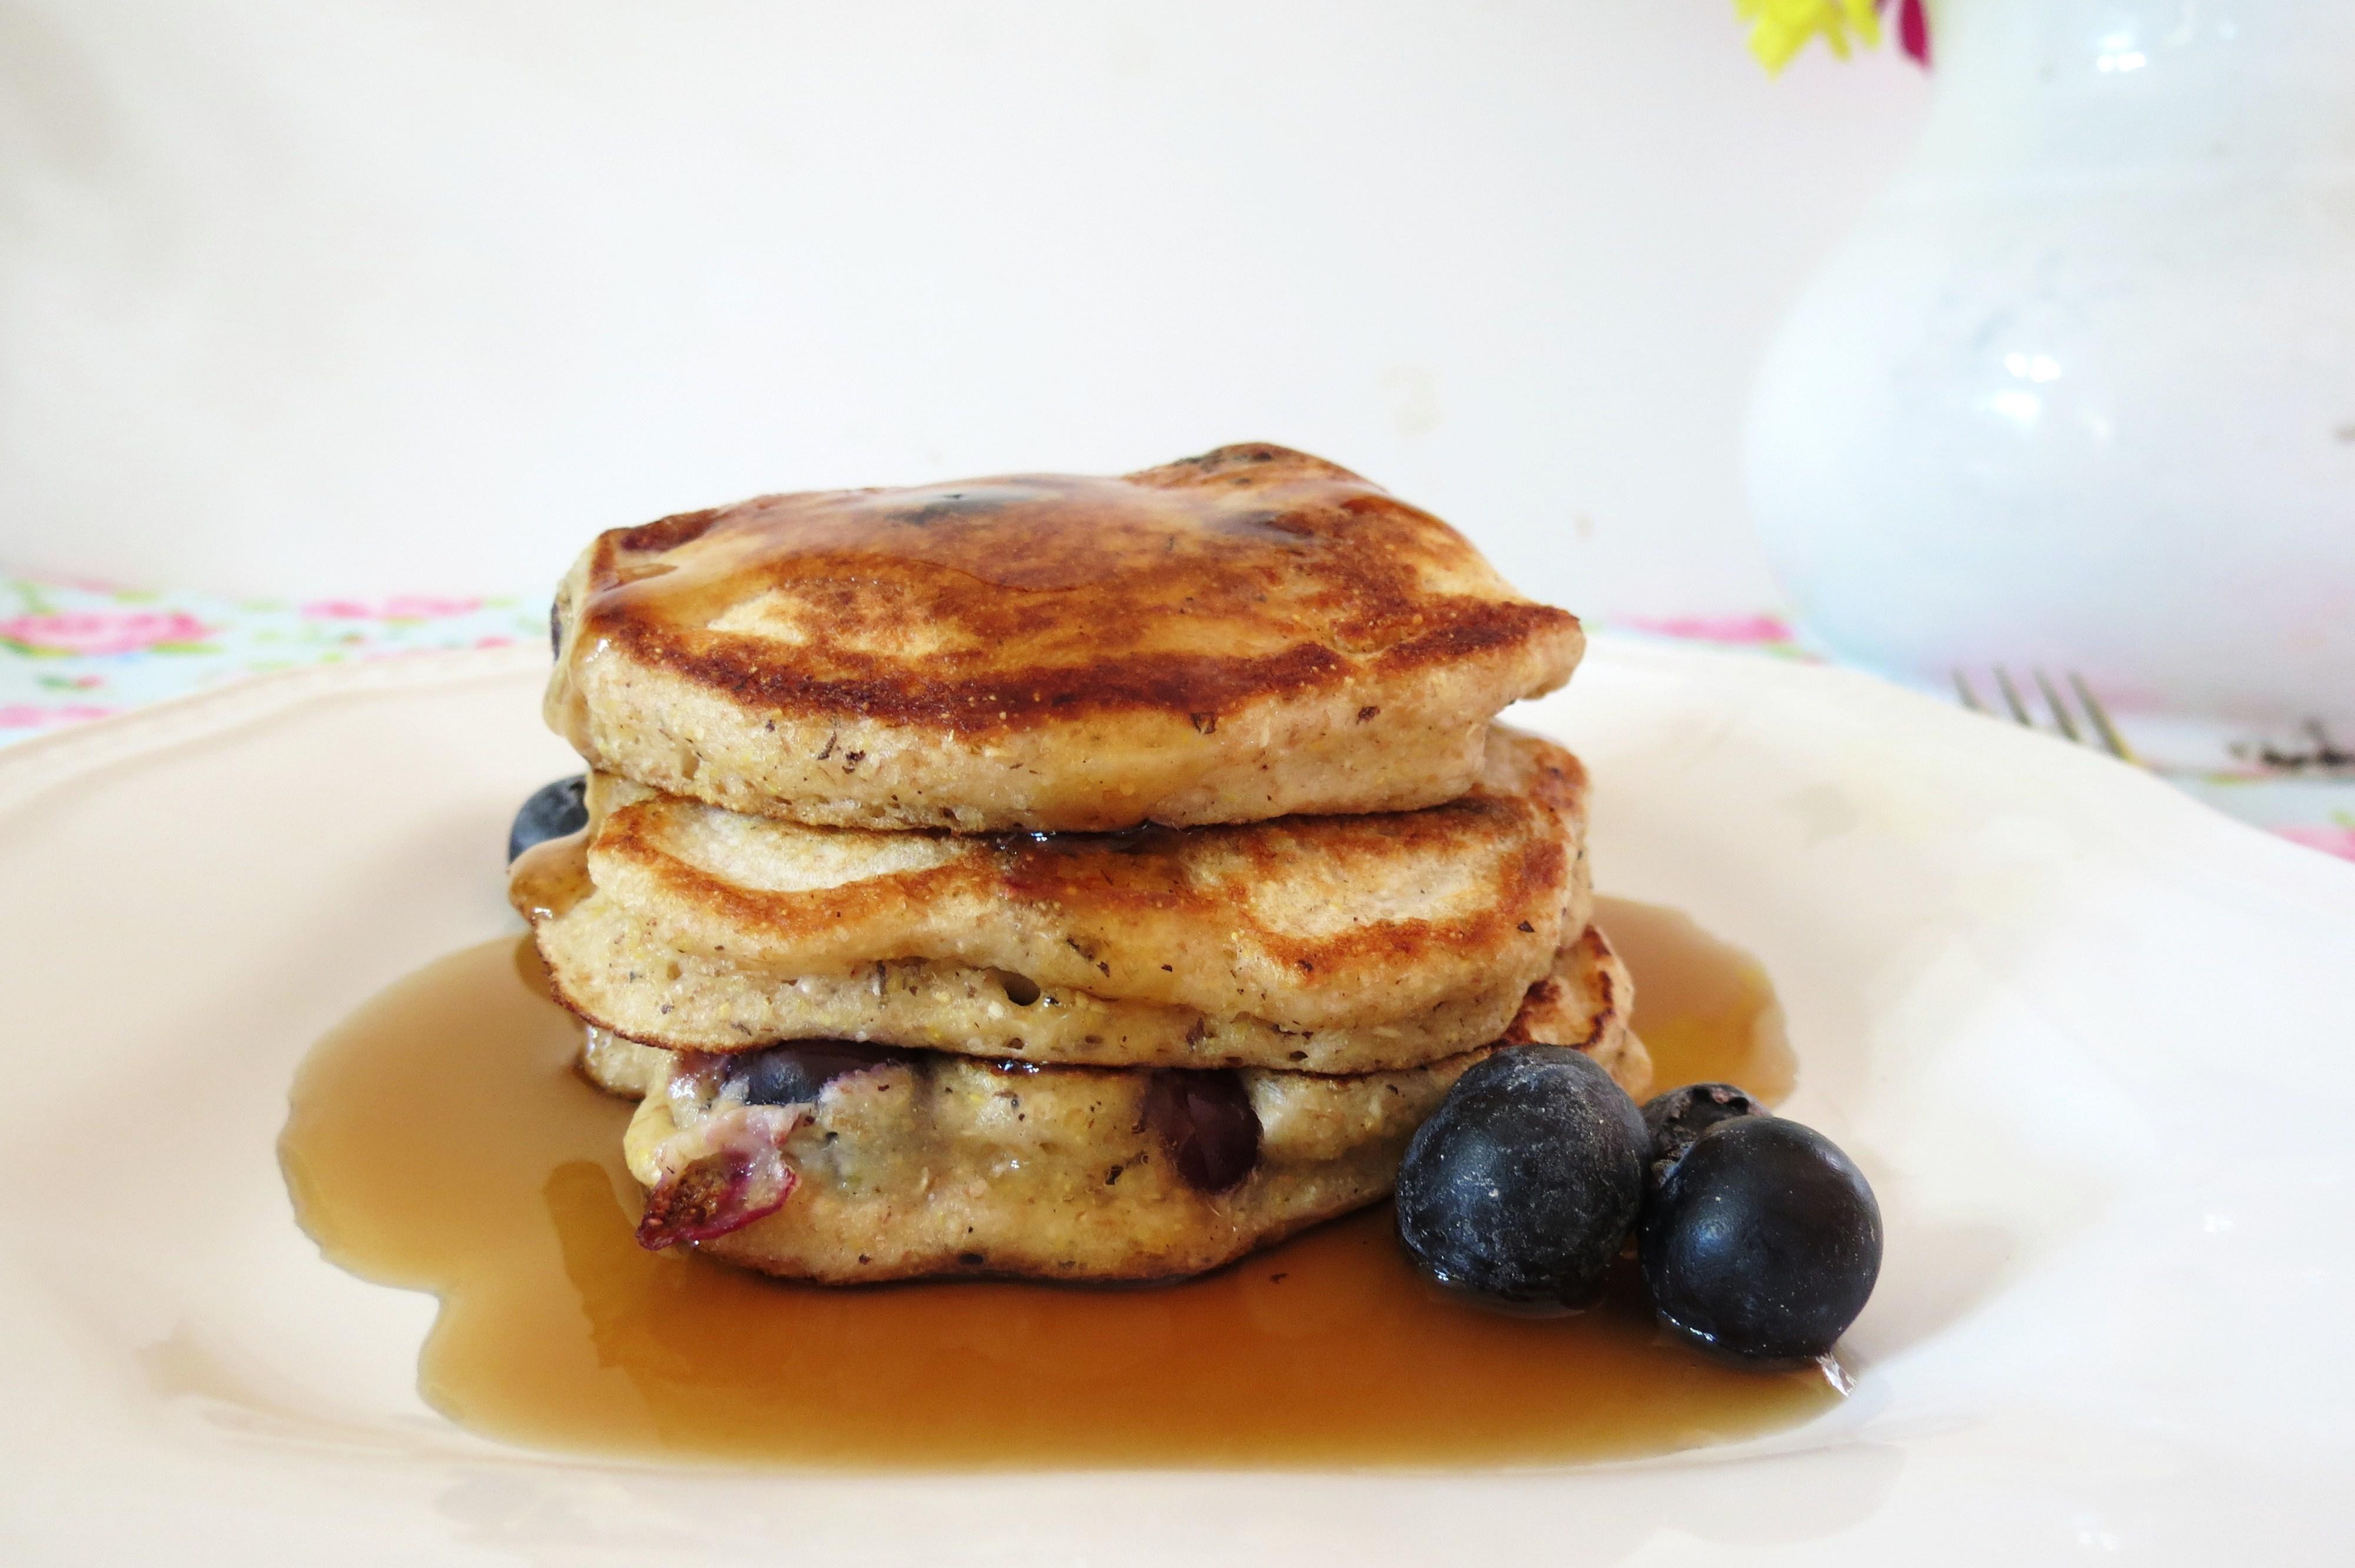 ... thick Blueberry Pancake, made with Greek Yogurt and Spelt Pancake Mix